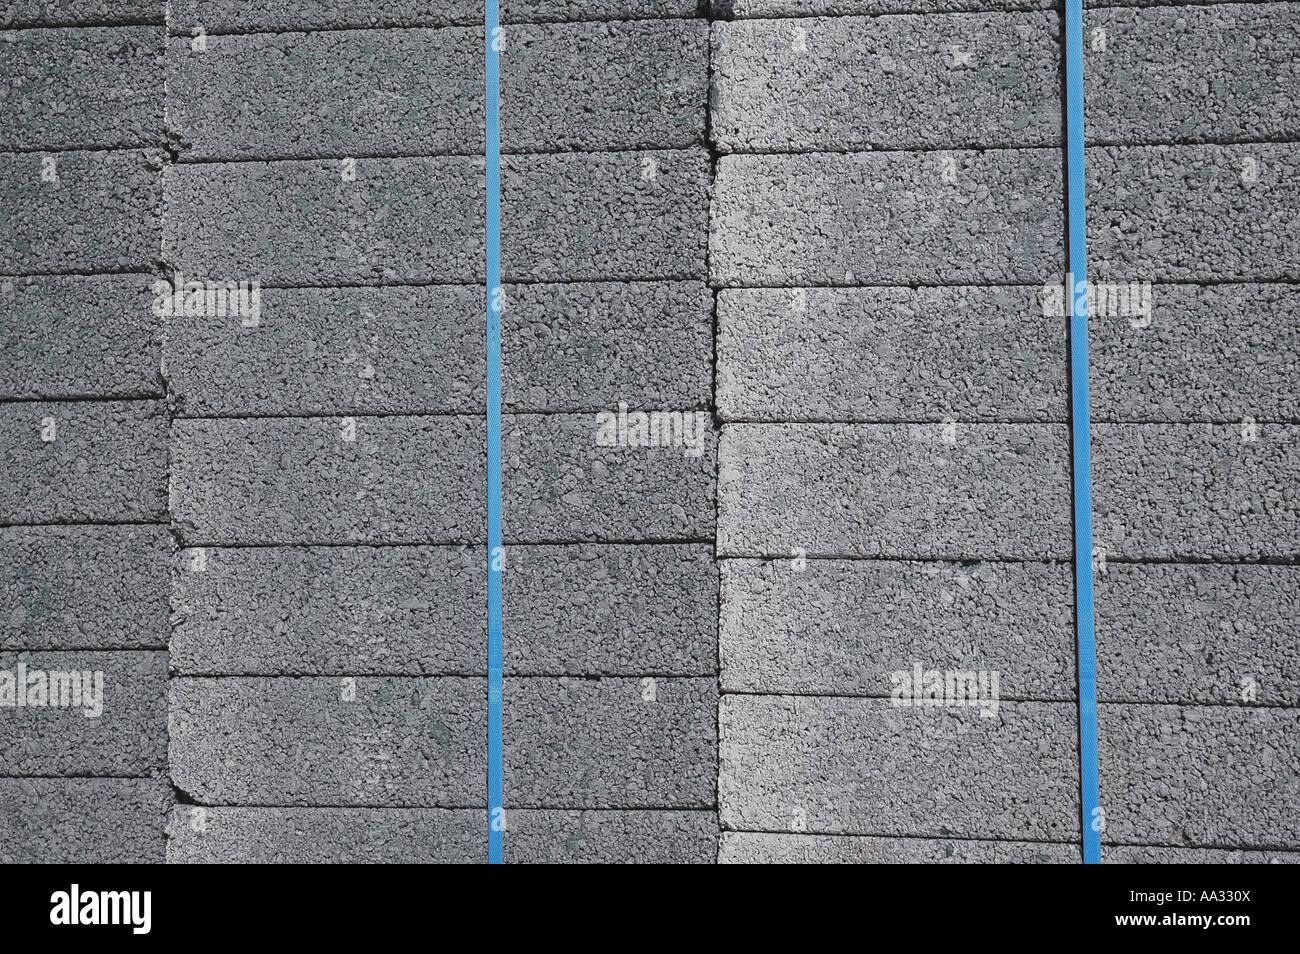 Blocos de concreto Imagens de Stock